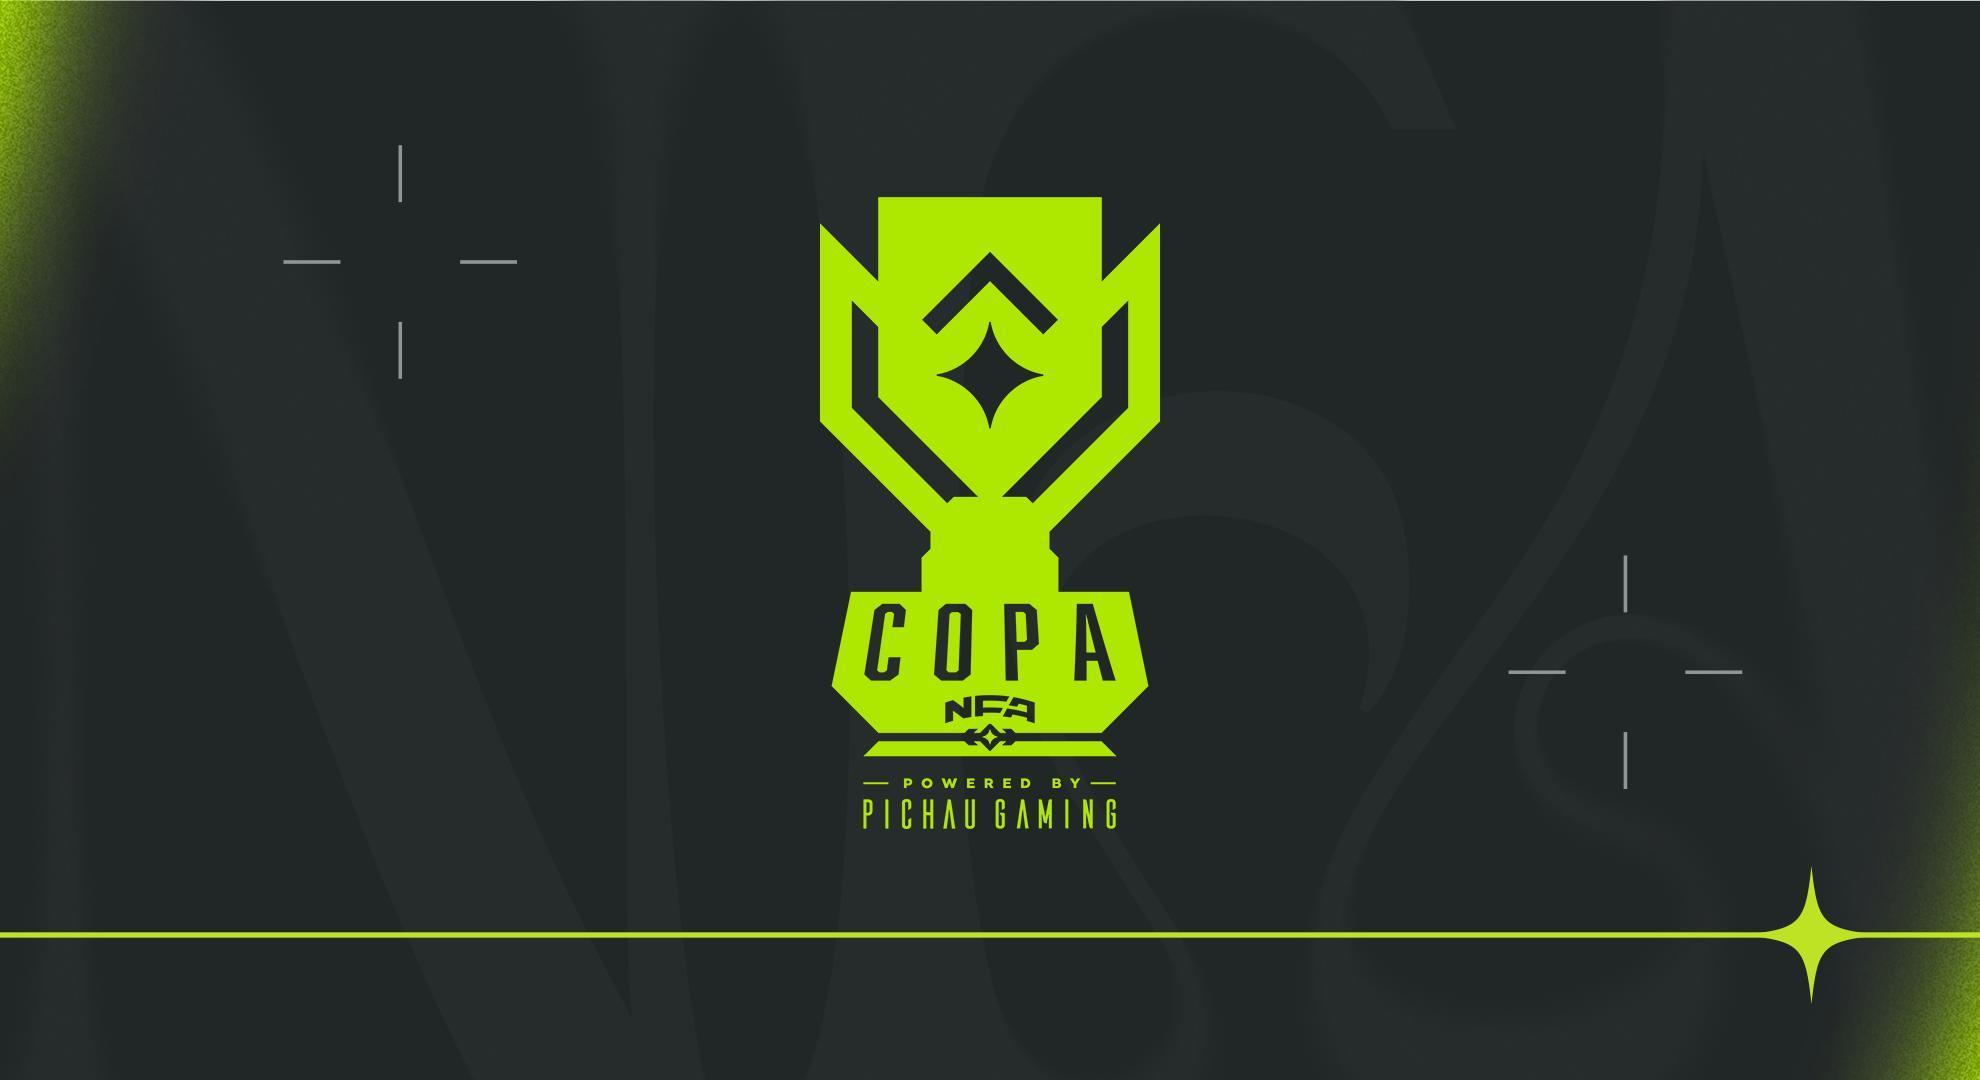 COPA NFA S5 2021: Confira os 12 times classificados para o primeiro presencial da história da NFA